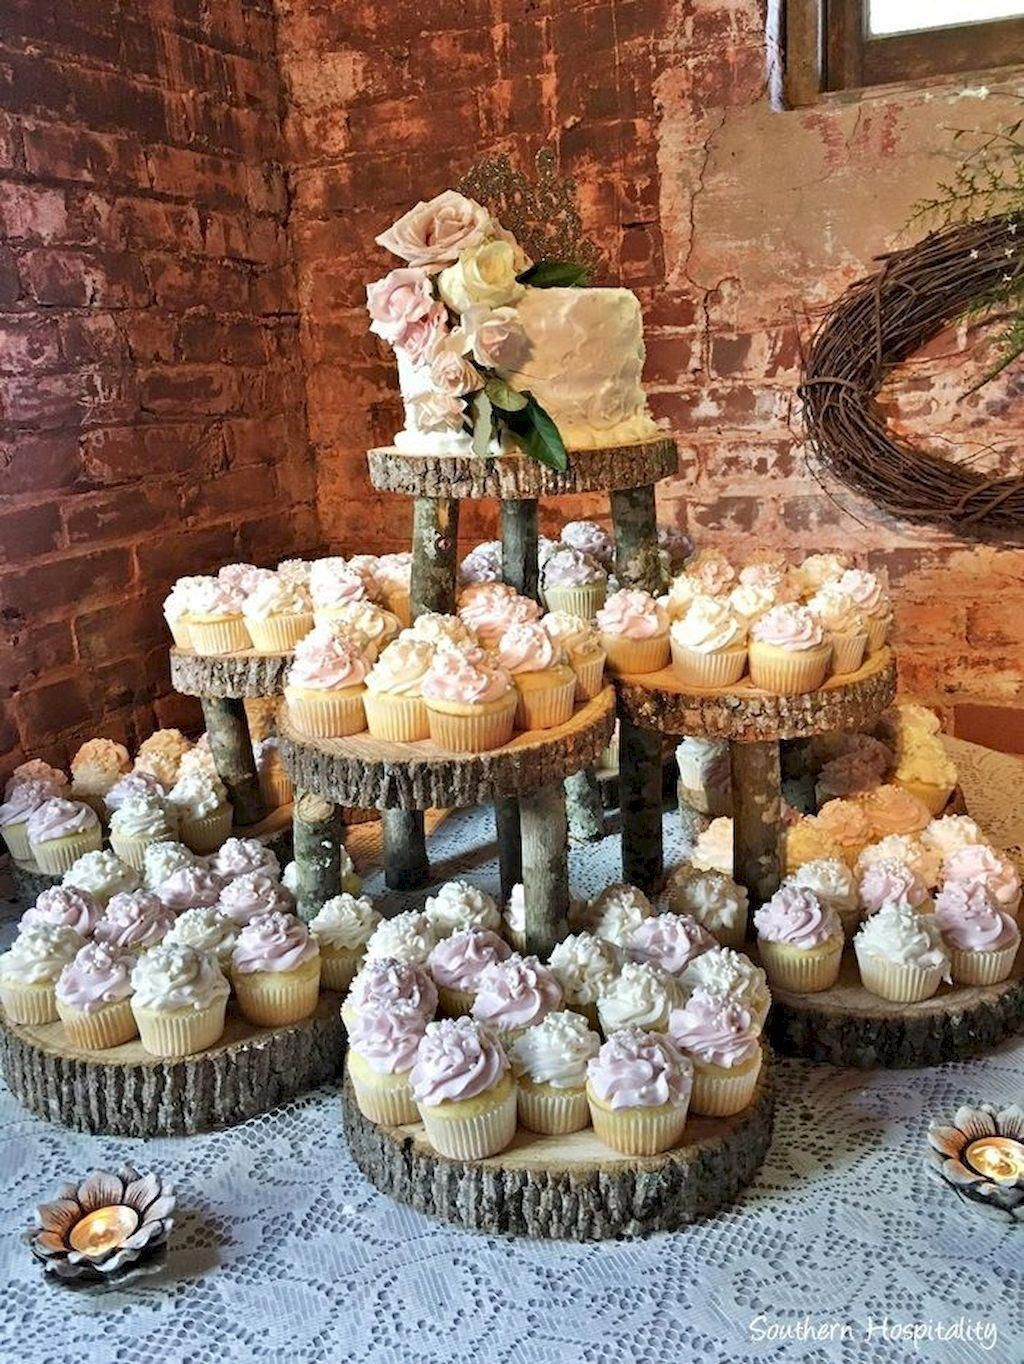 56 OF THE BEST FALL WEDDING IDEAS (23) #planmywedding ...